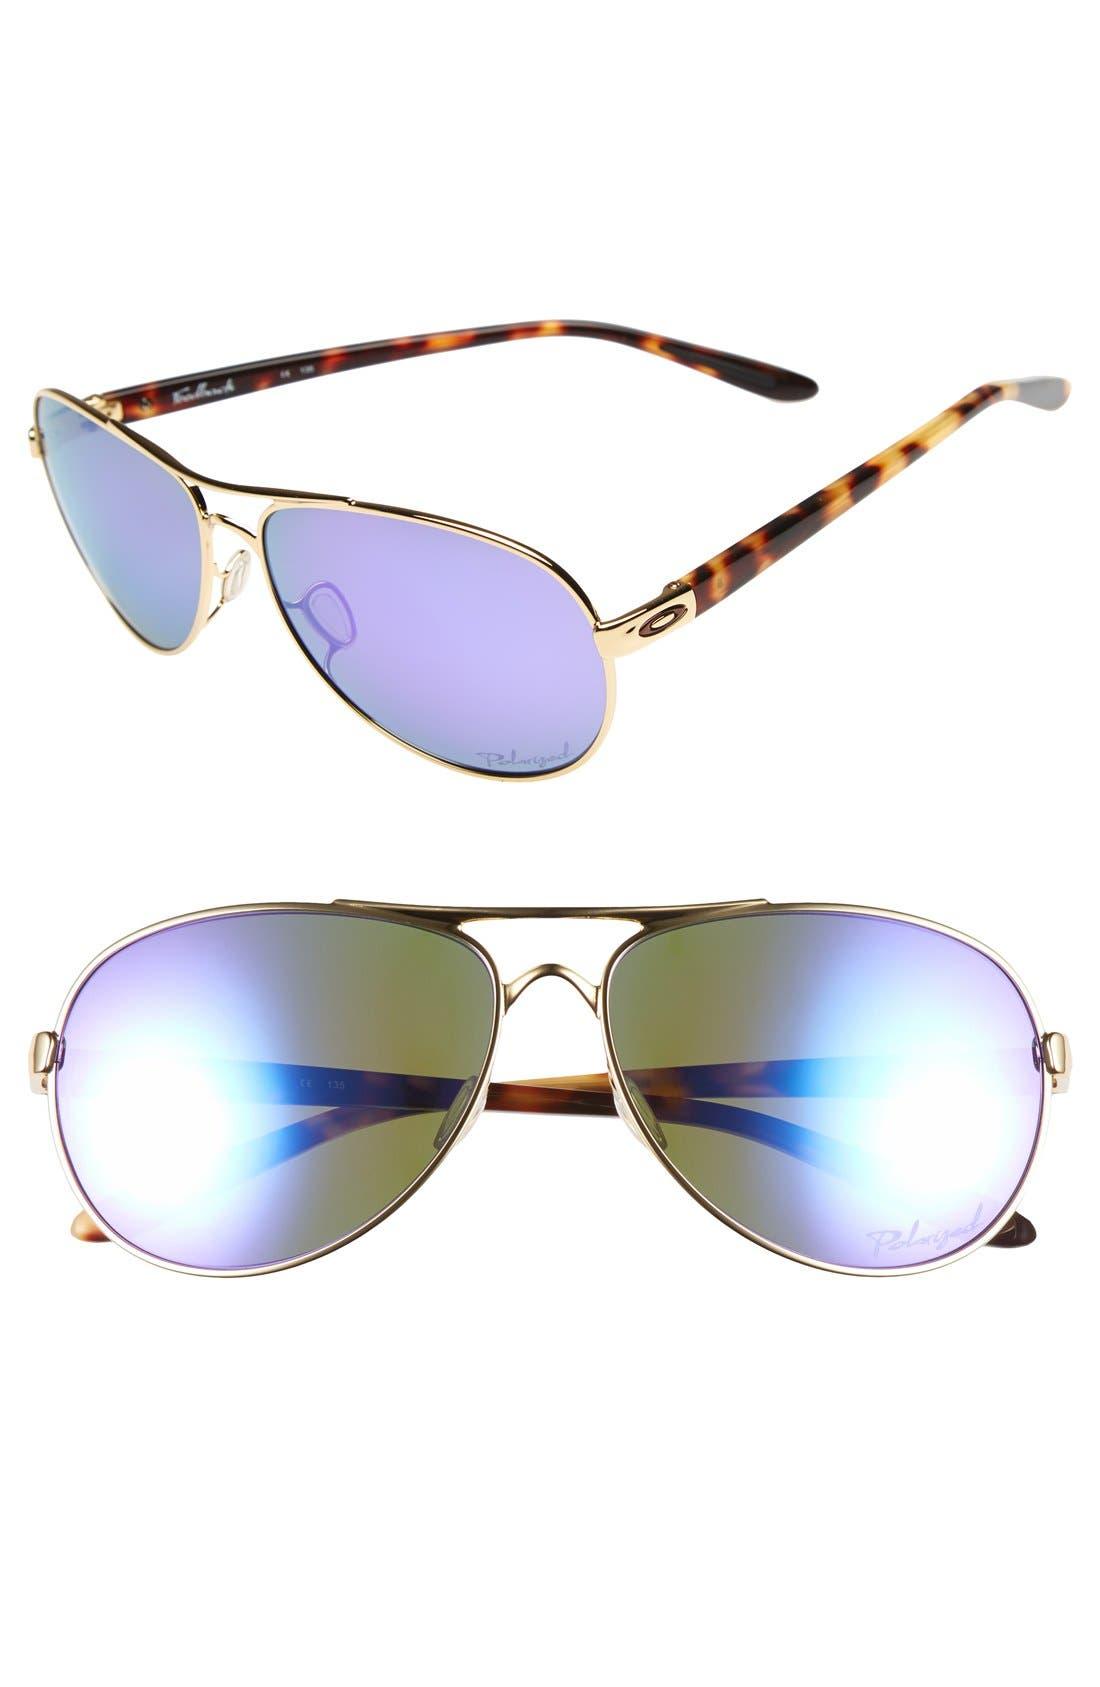 Oakley Feedback 59mm Polarized Sunglasses Nordstrom